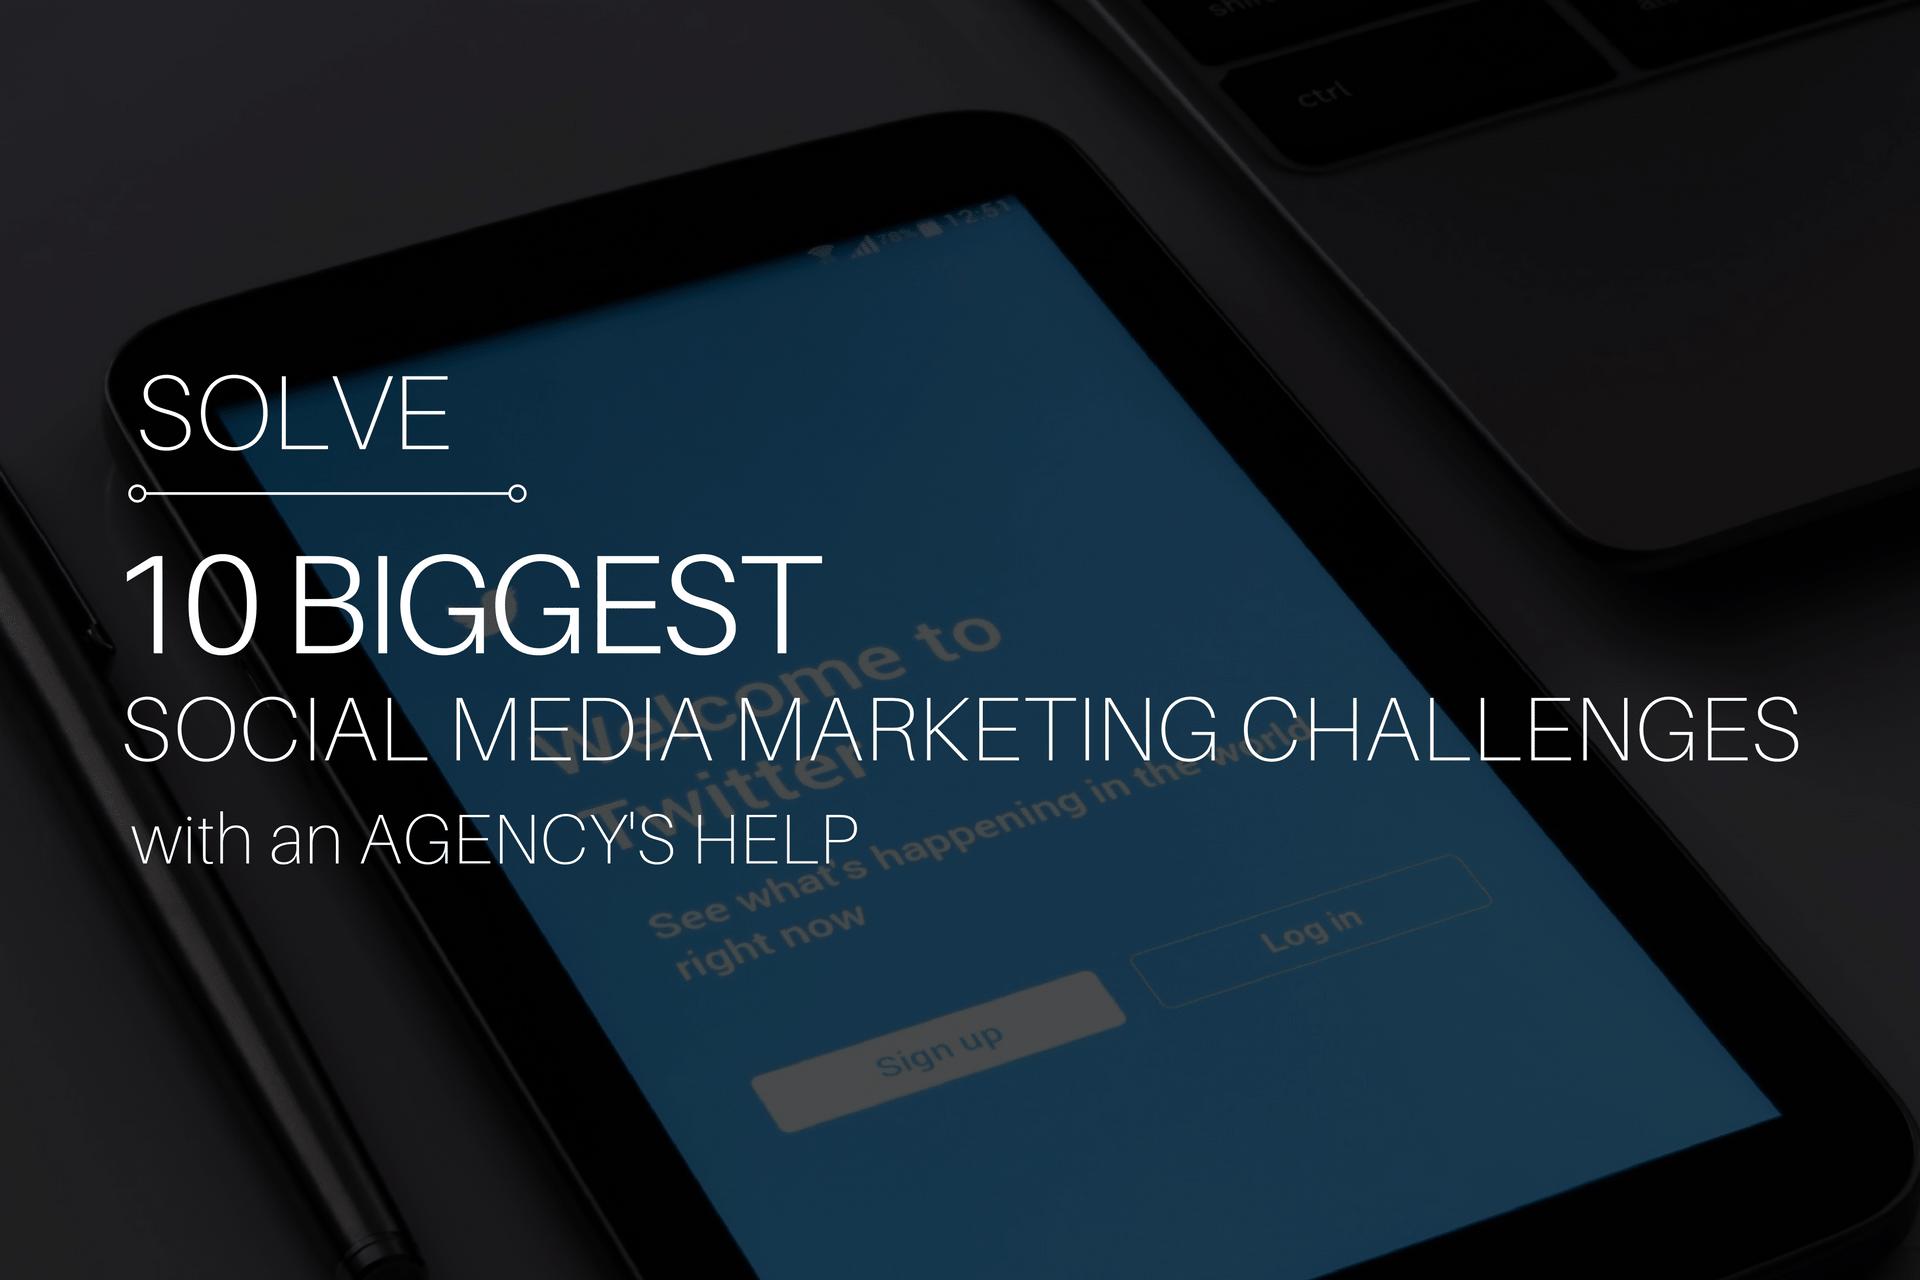 Social media marketing agency Silicon Valley